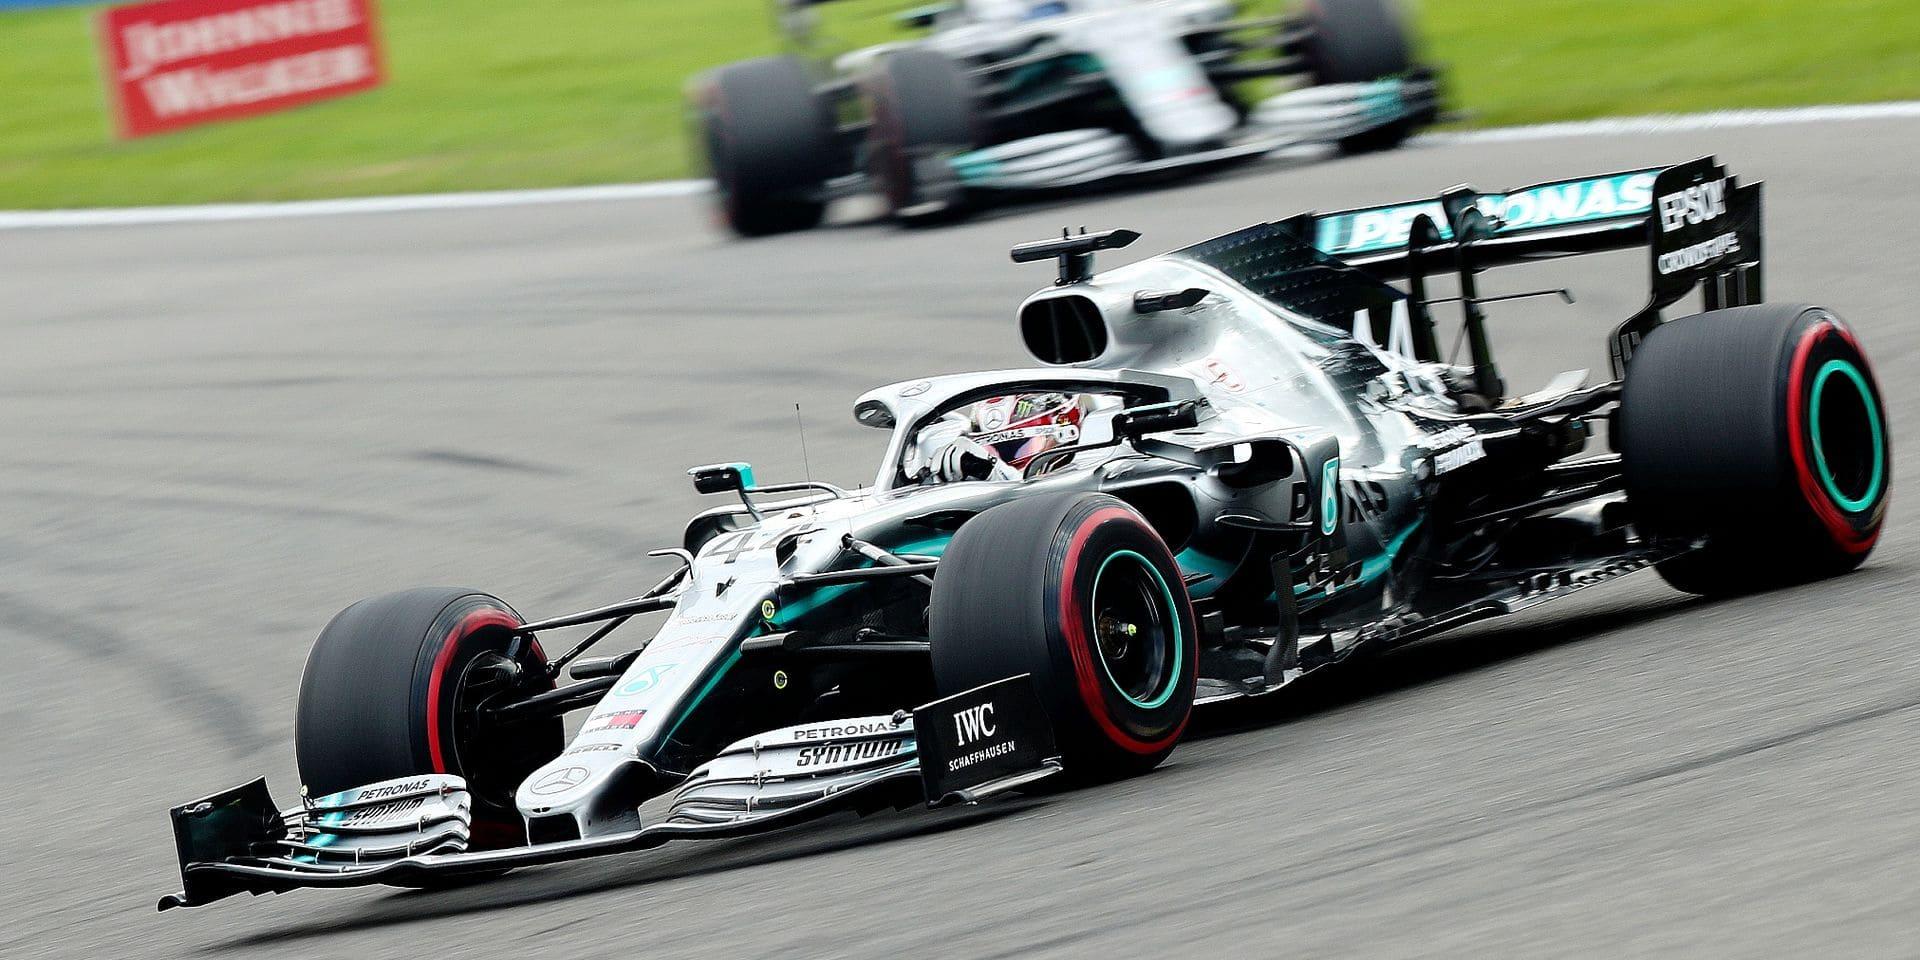 Mercedes redescend sur terre